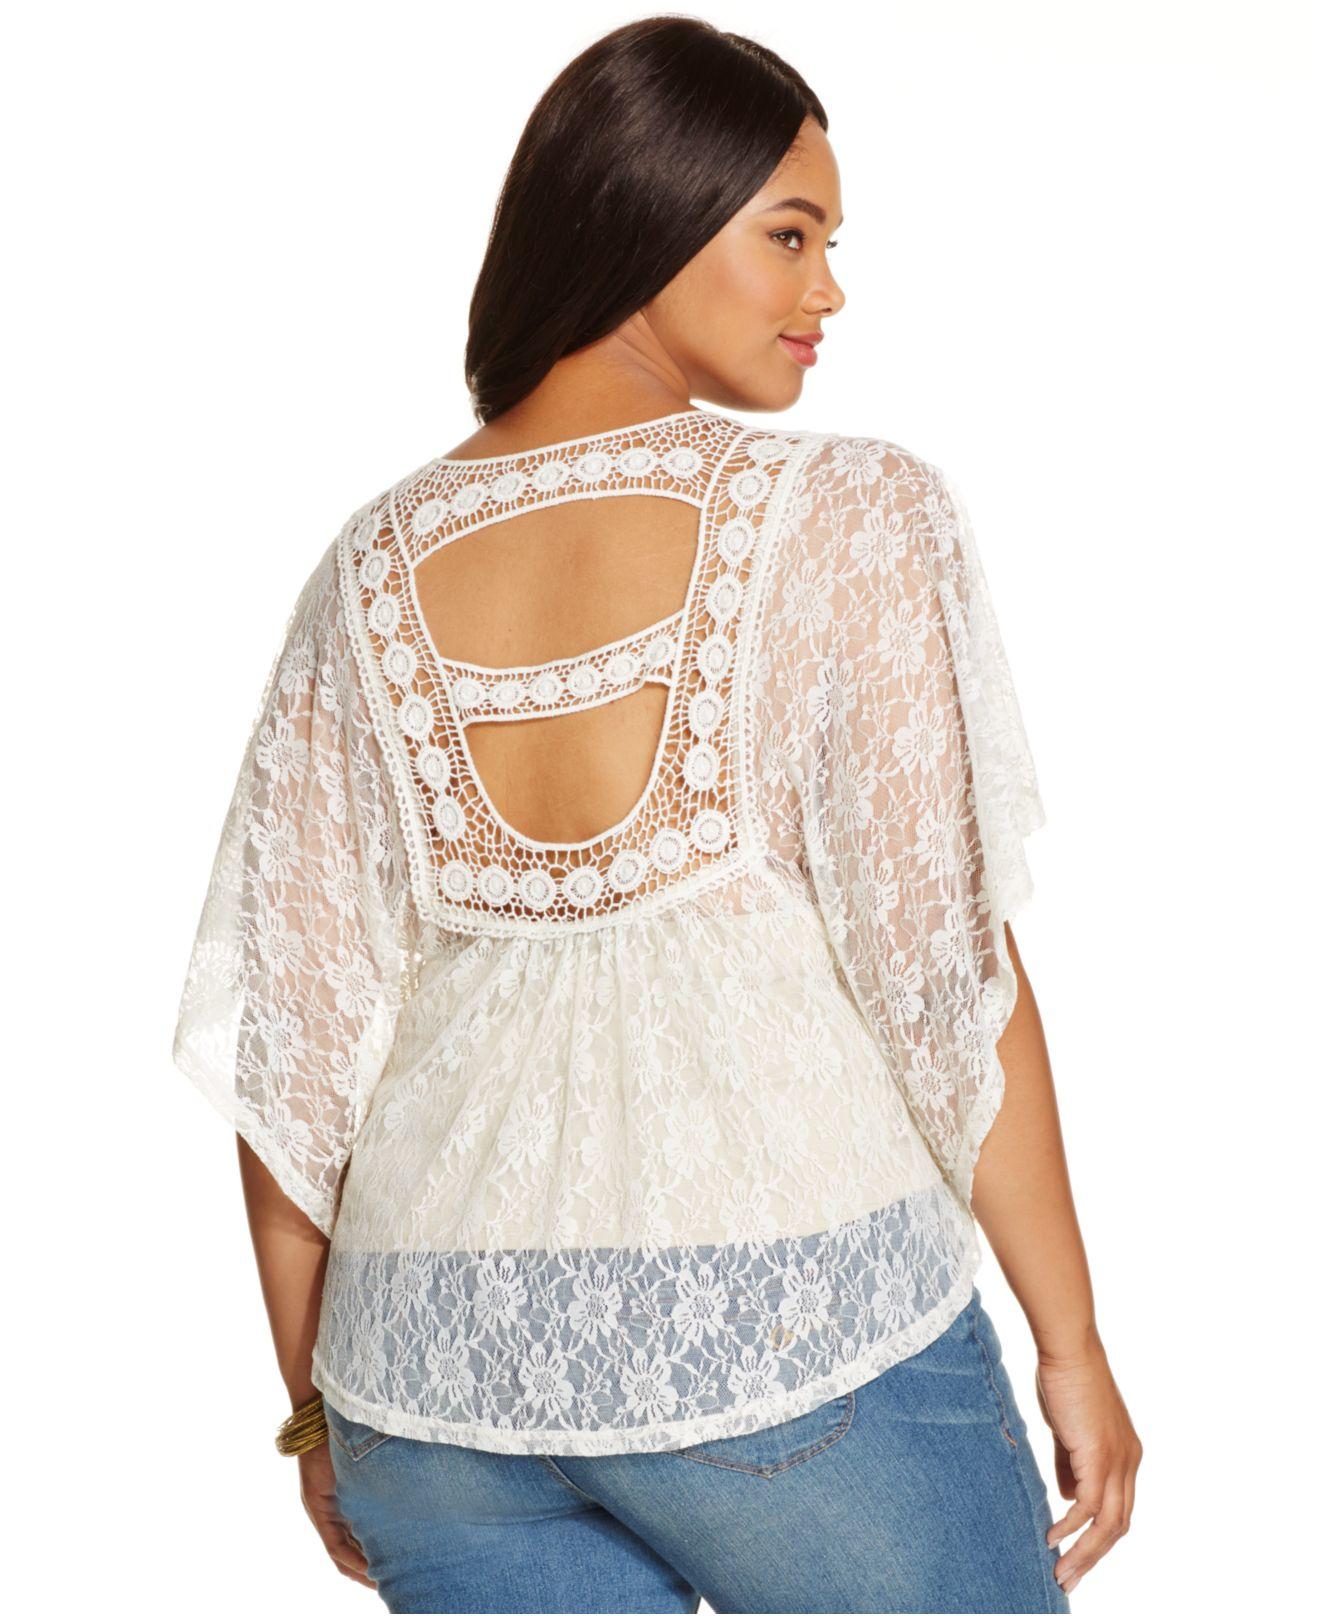 e6ca7858ecec2 Lyst - American Rag Plus Size Cutout-back Lace Poncho Top in Natural